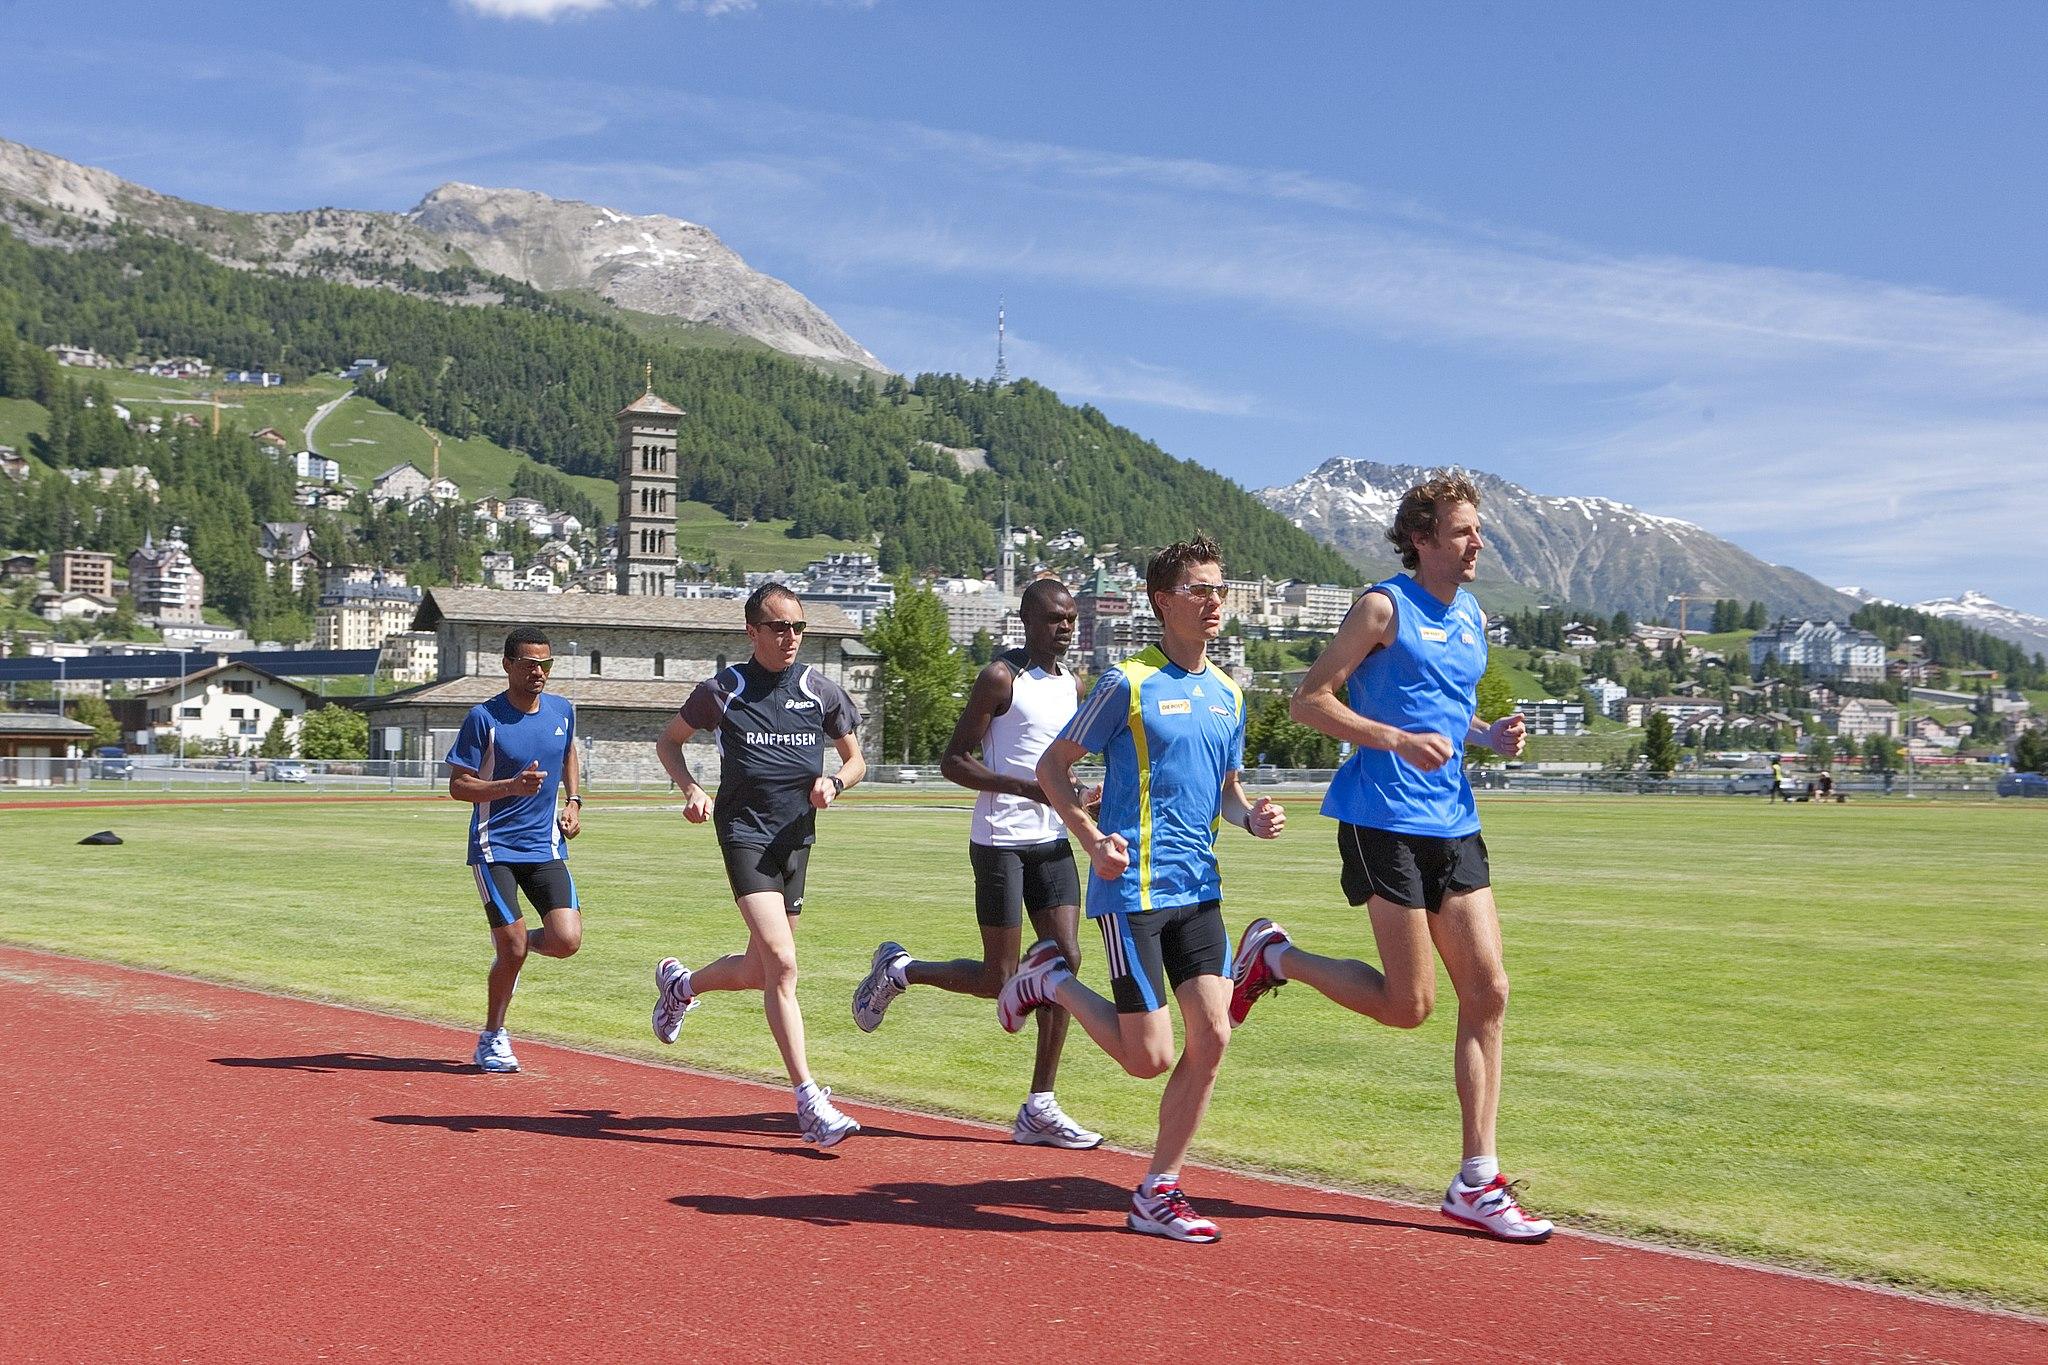 Athletic high altitude training